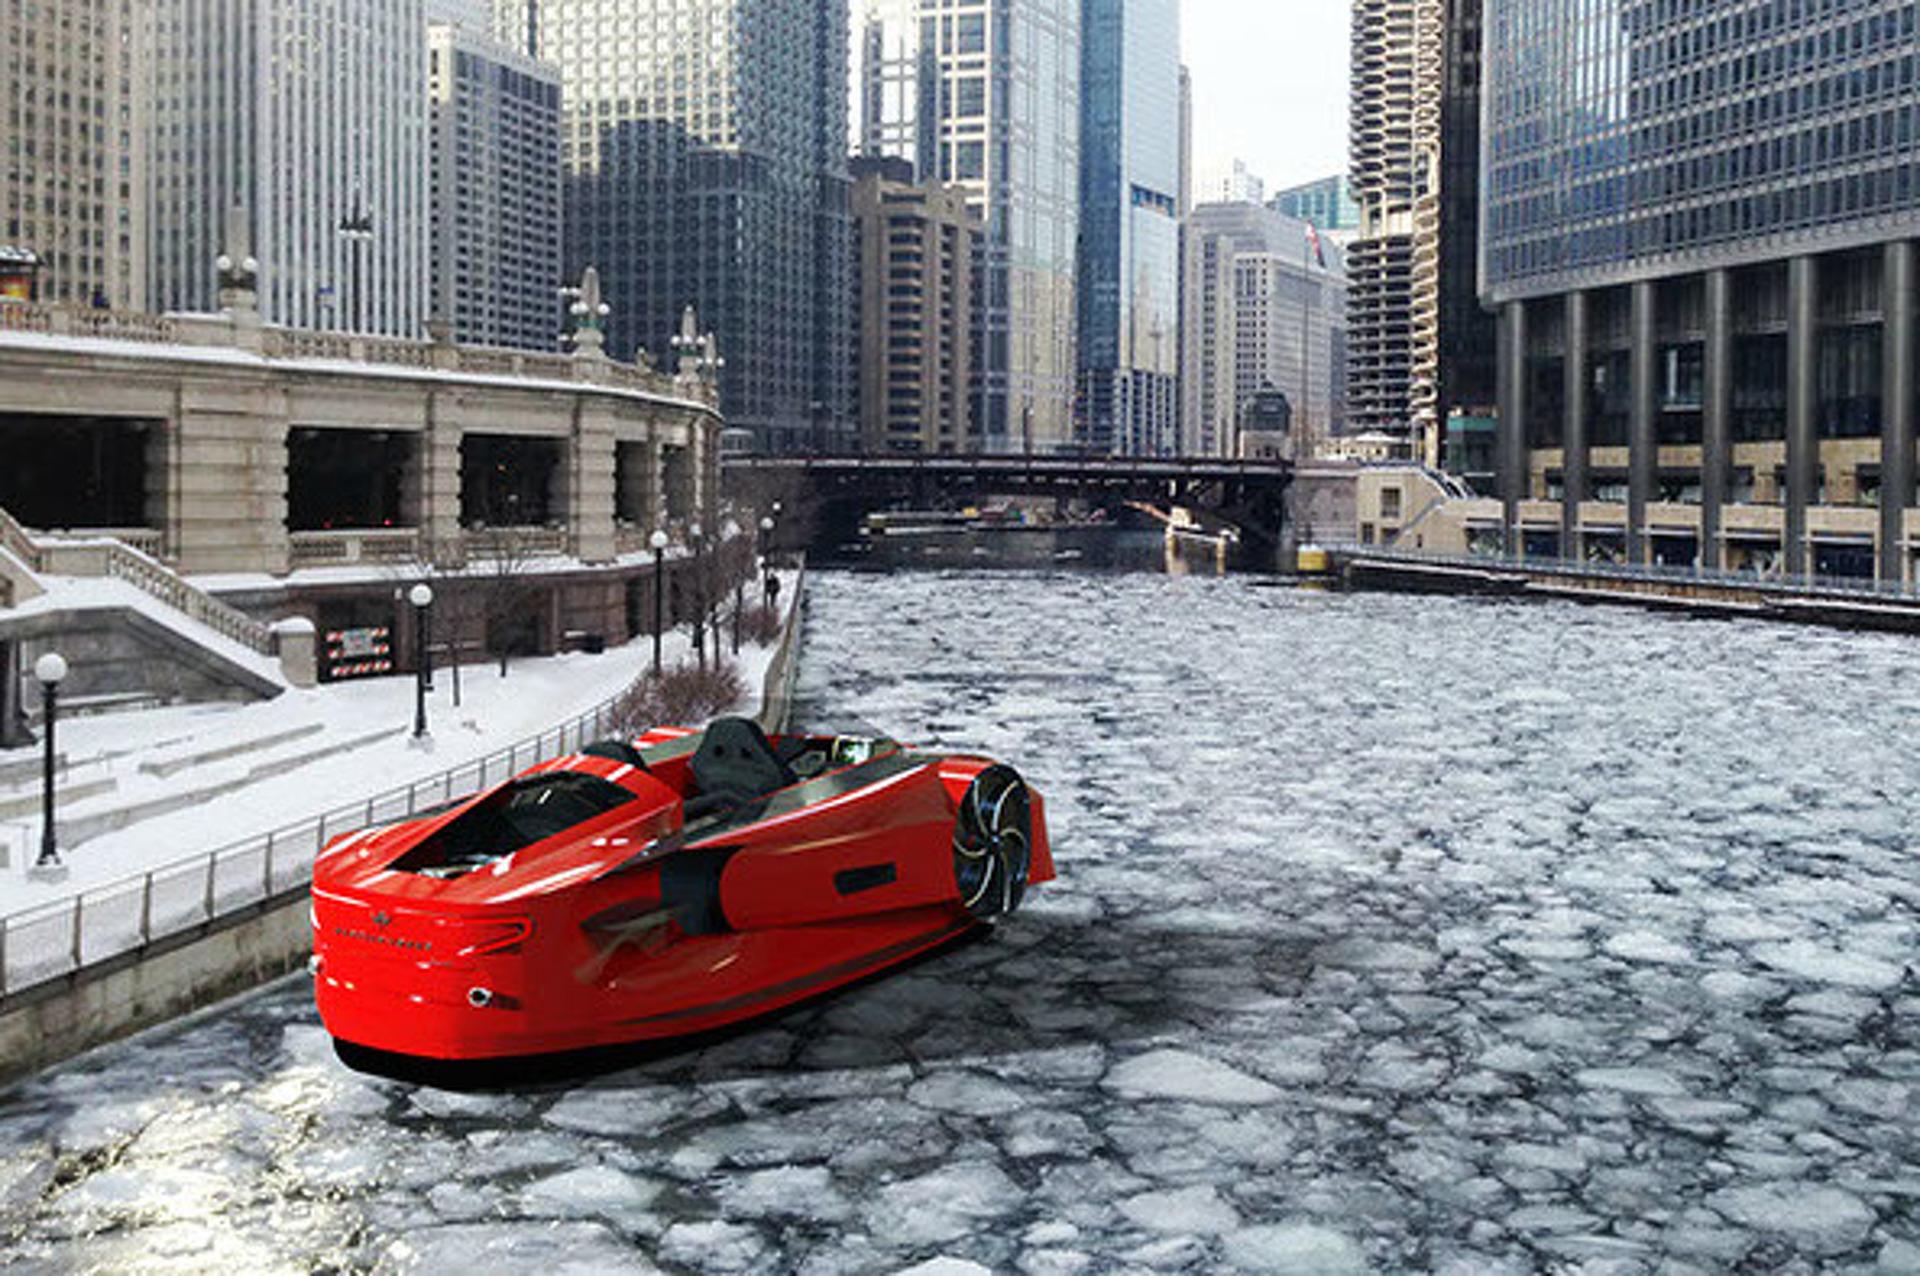 Chicago-Based Mercier-Jones Unveils an Everyday Hovercraft